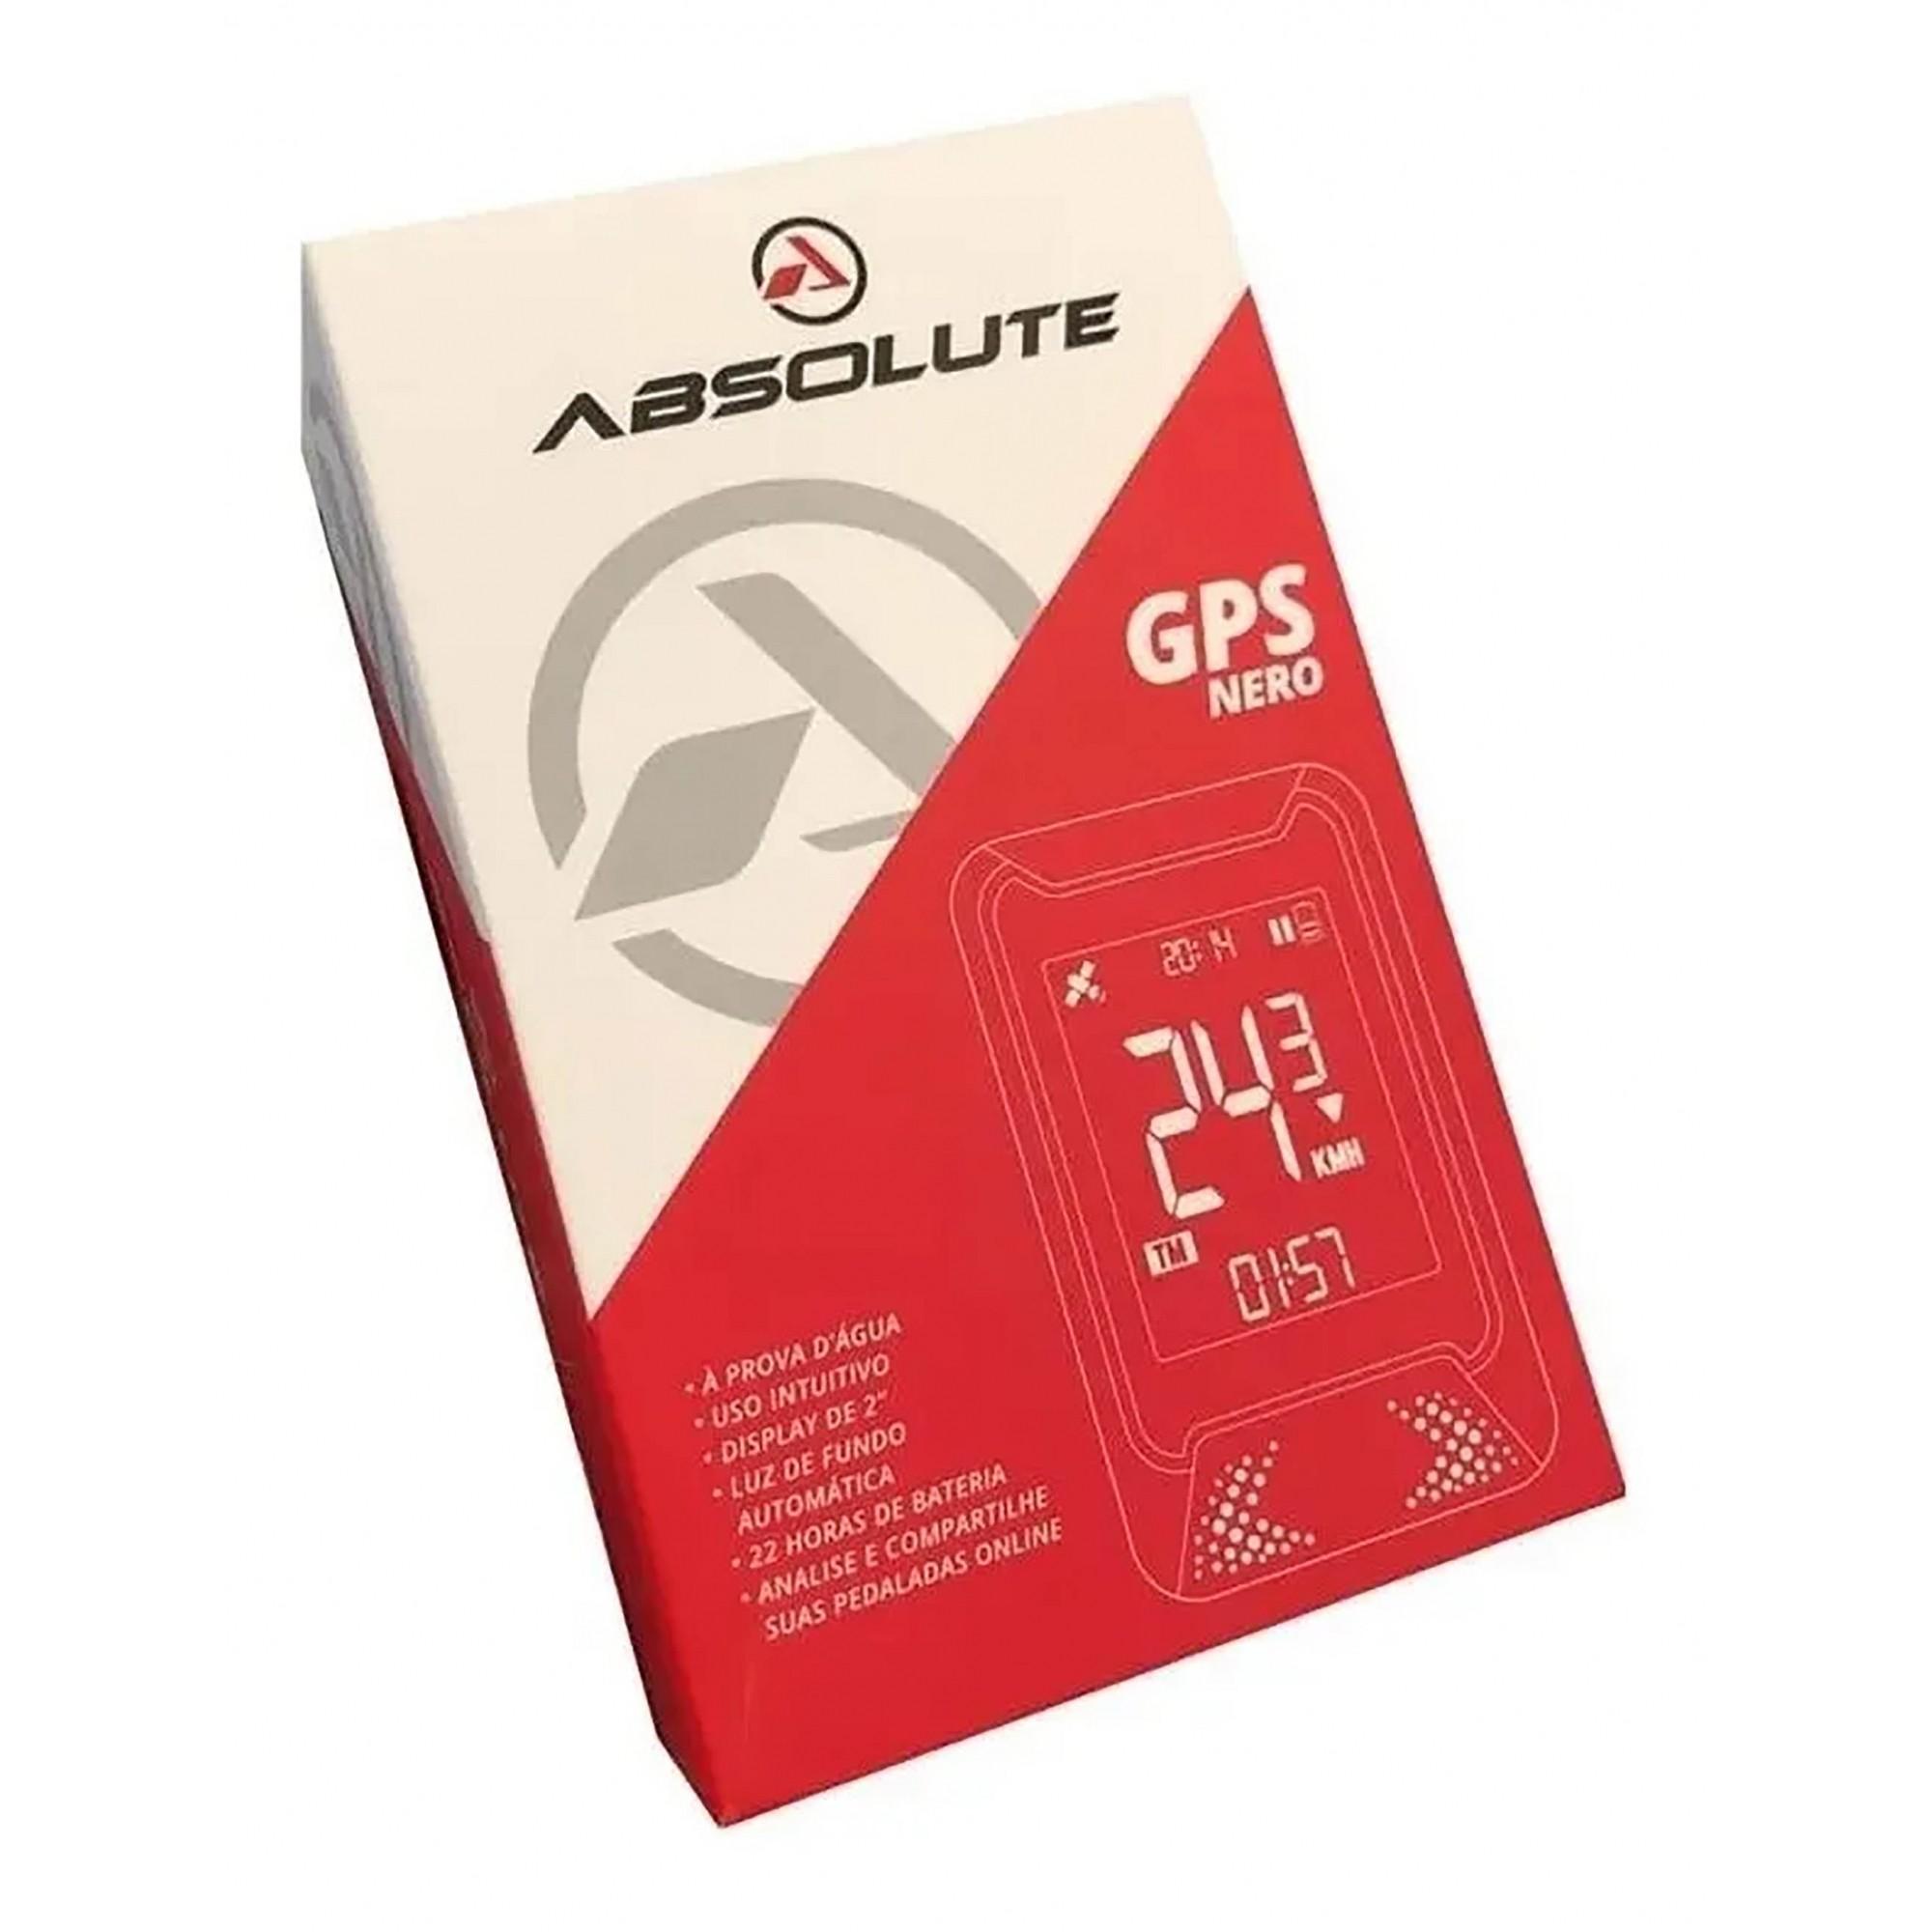 GPS NERO PTO/CINZA - ABSOLUTE